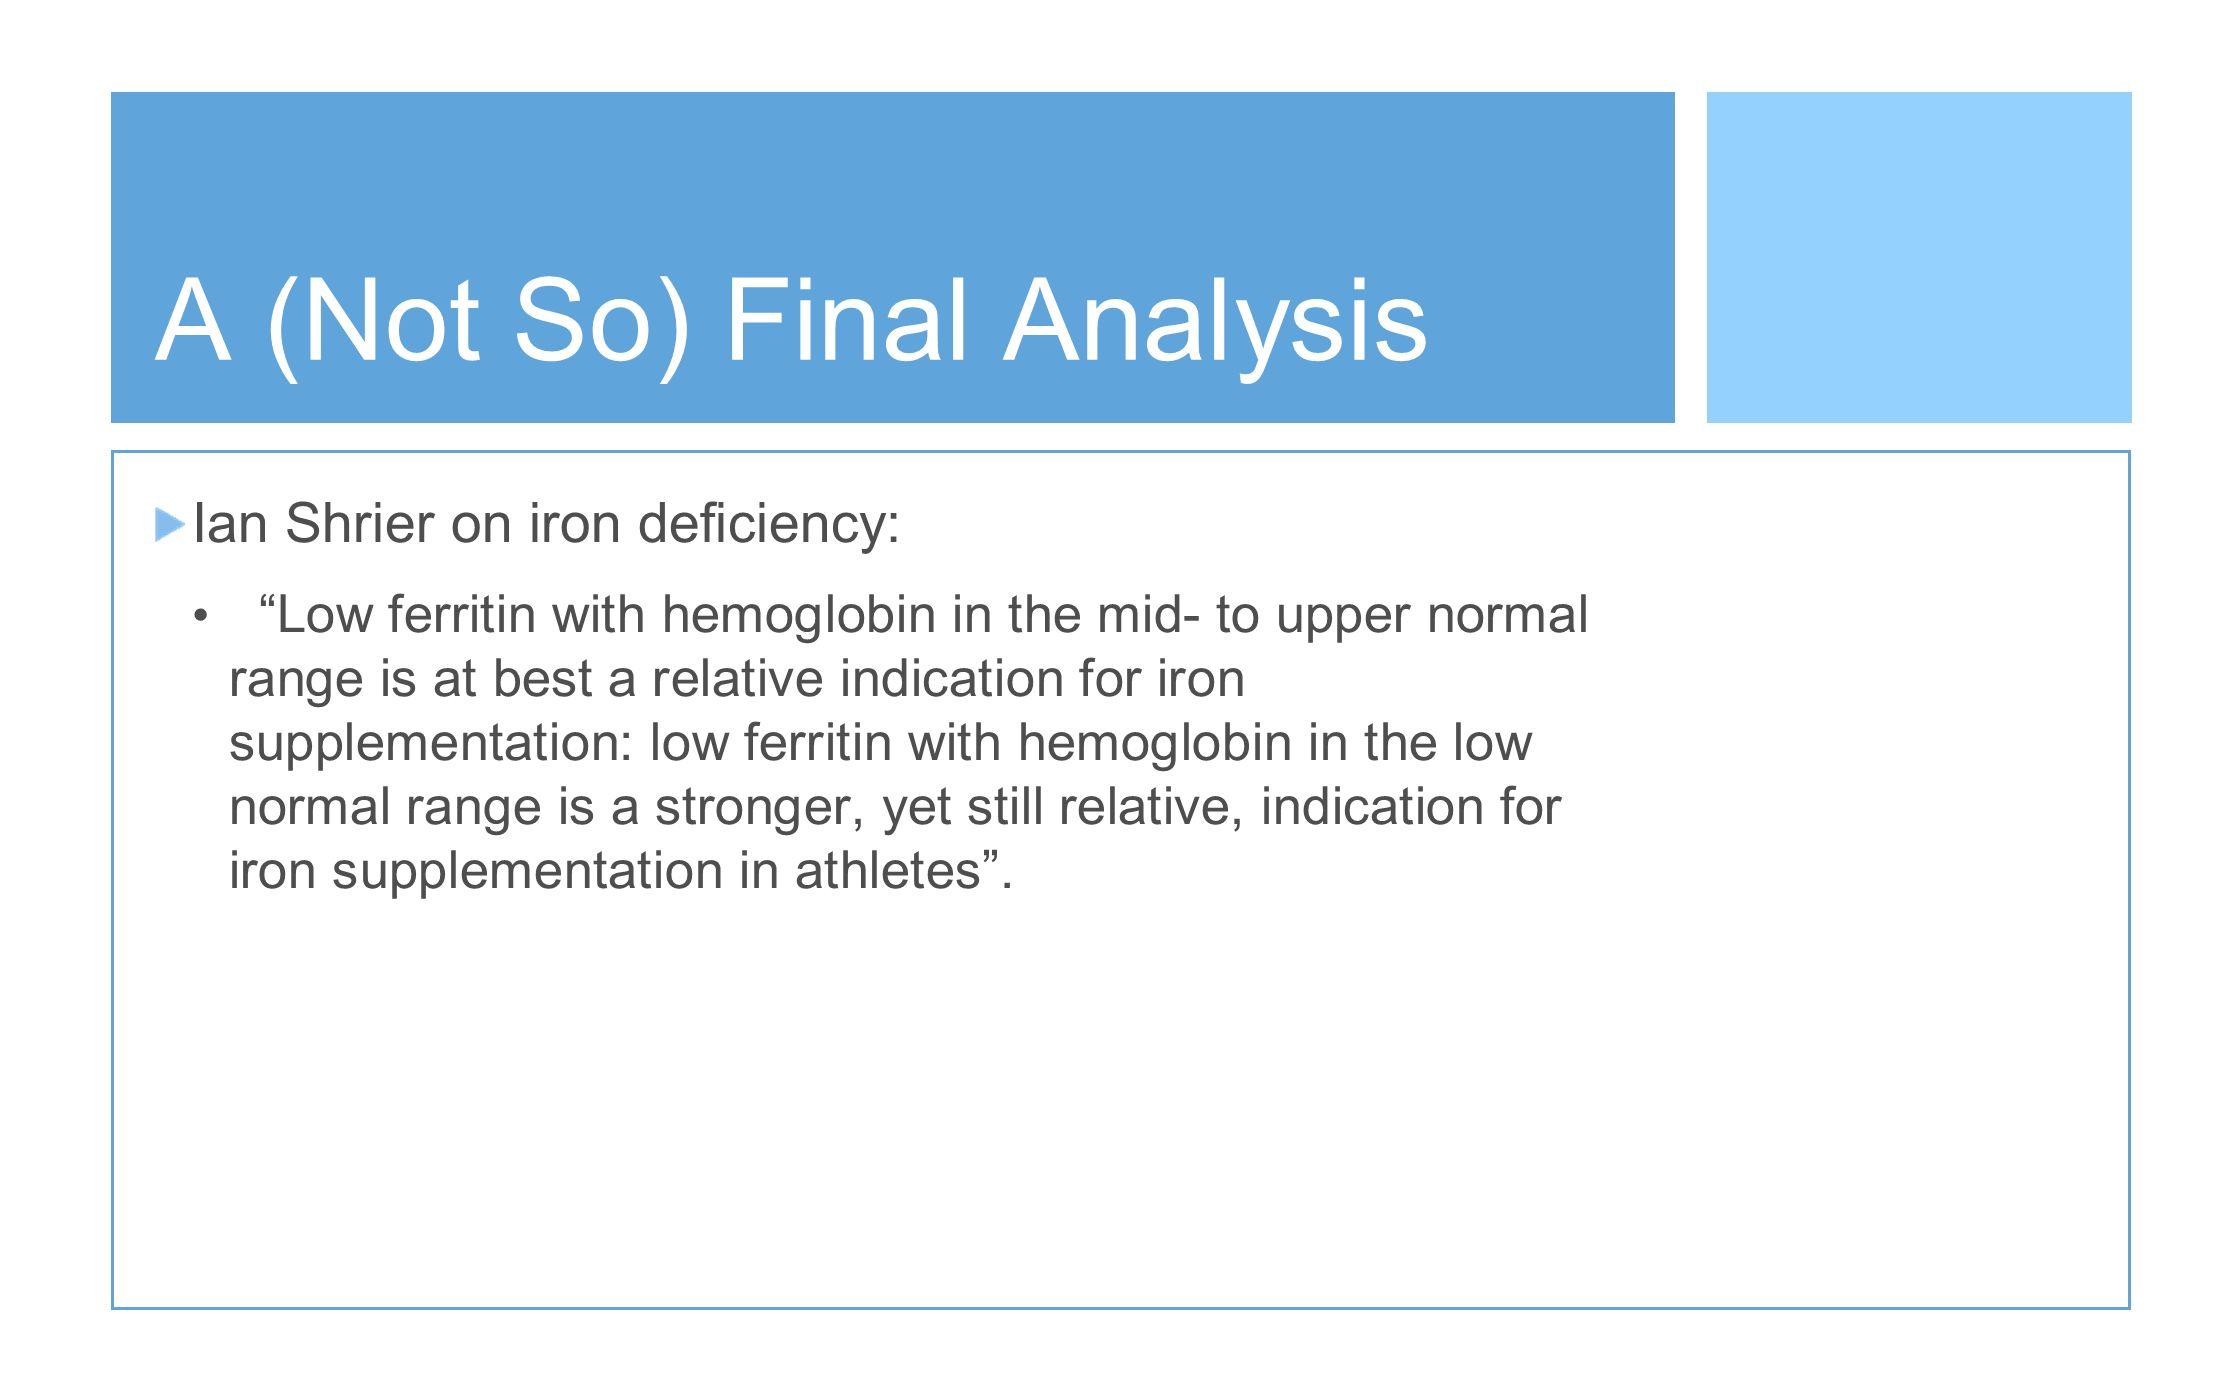 A (Not So) Final Analysis